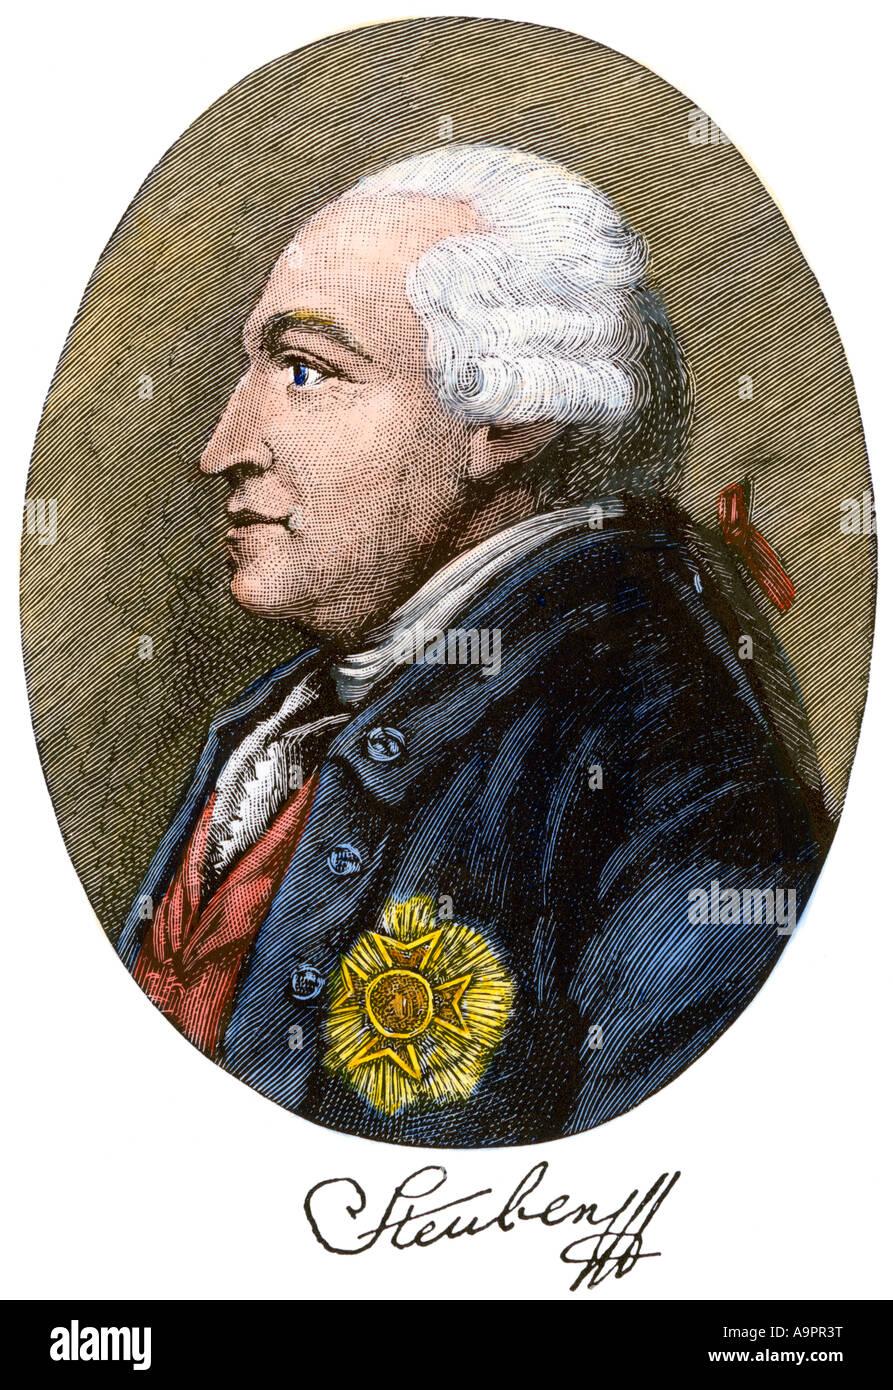 Friedrich Wilhelm von Steuben with his autograph. Hand-colored woodcut - Stock Image